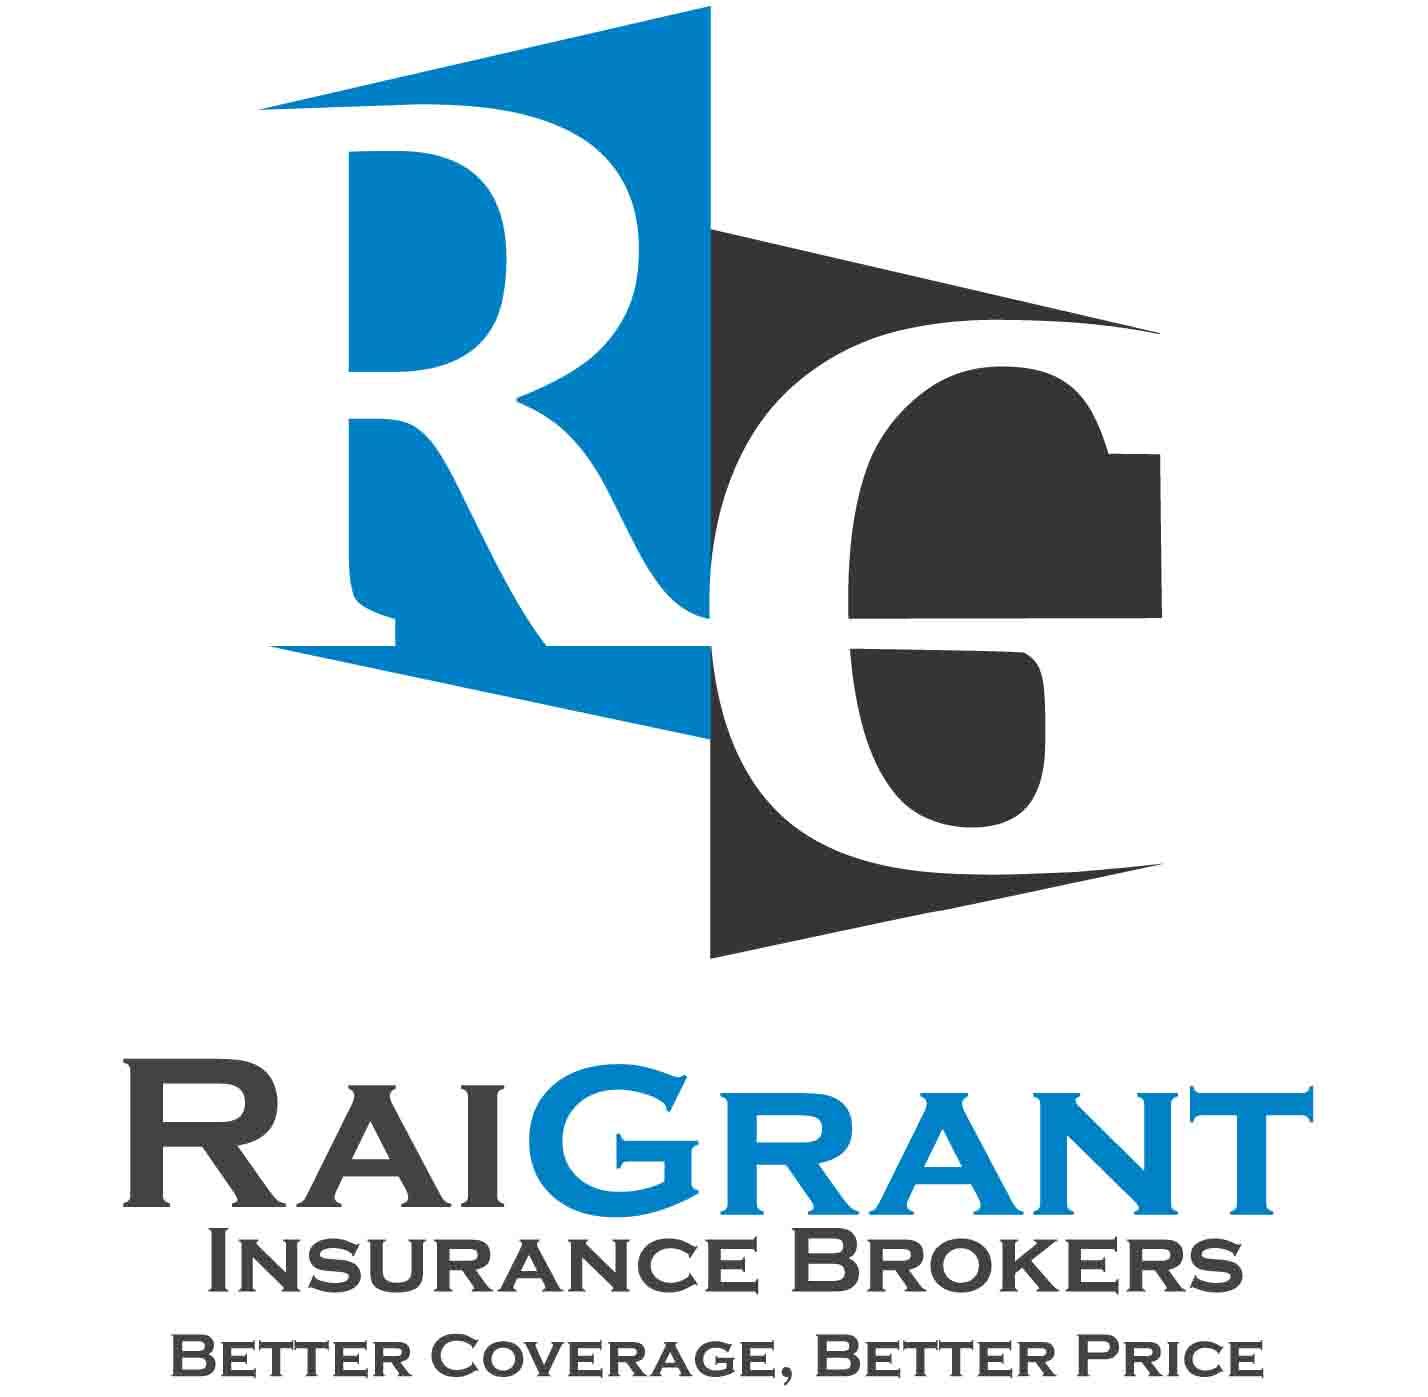 RaiGrant Insurance Brokers - 2017-02-17